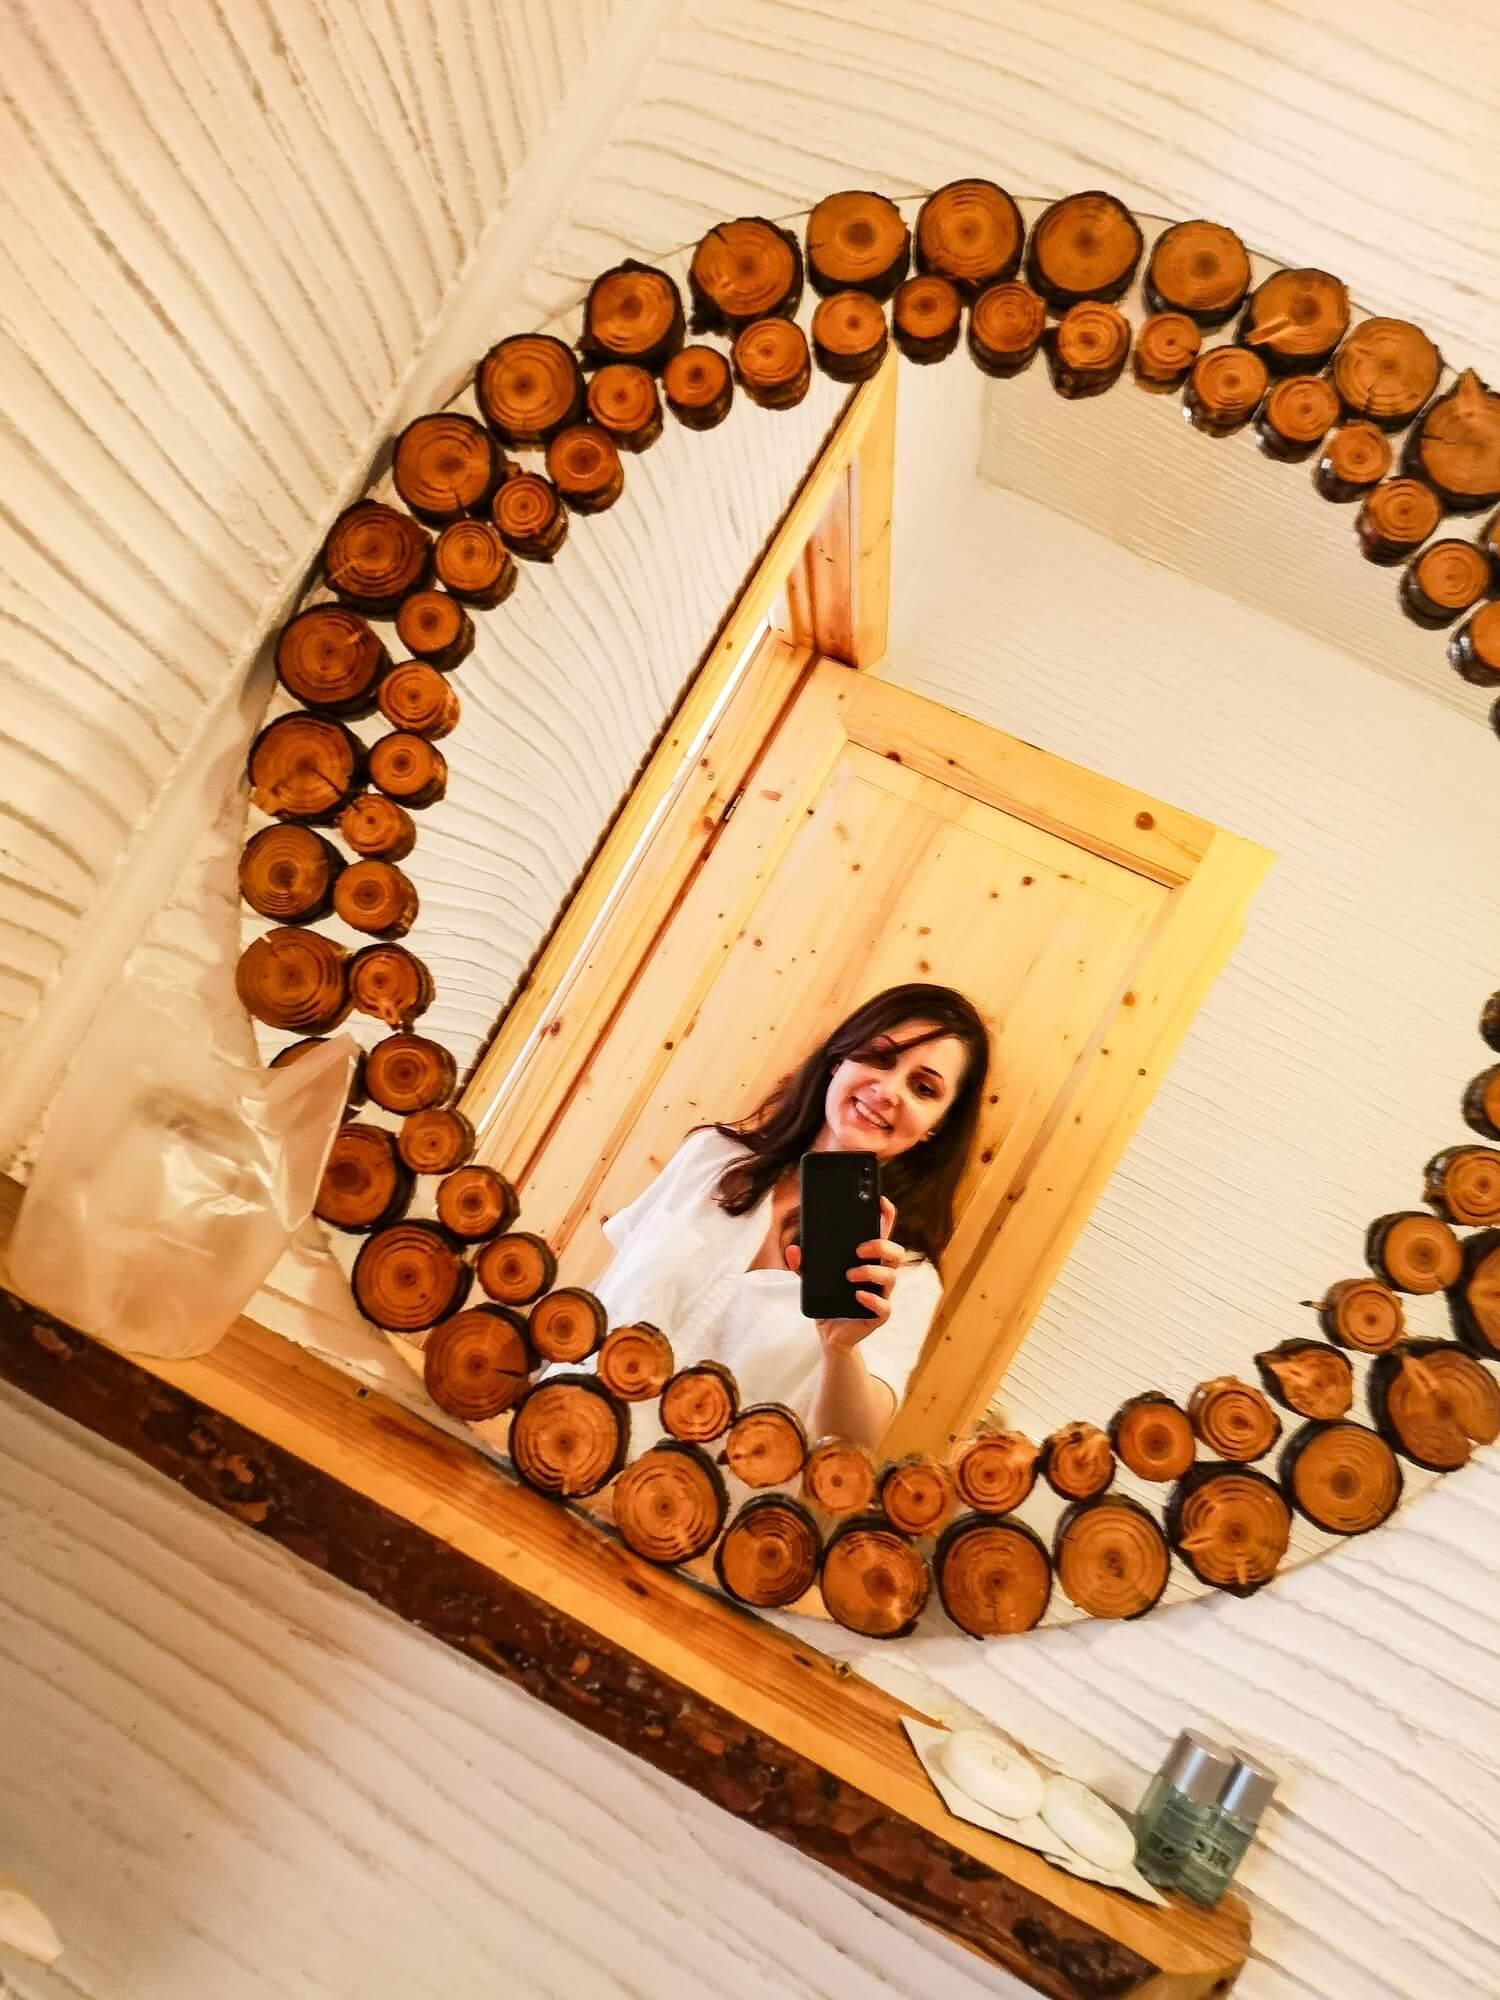 Slefie in the bathroom mirror